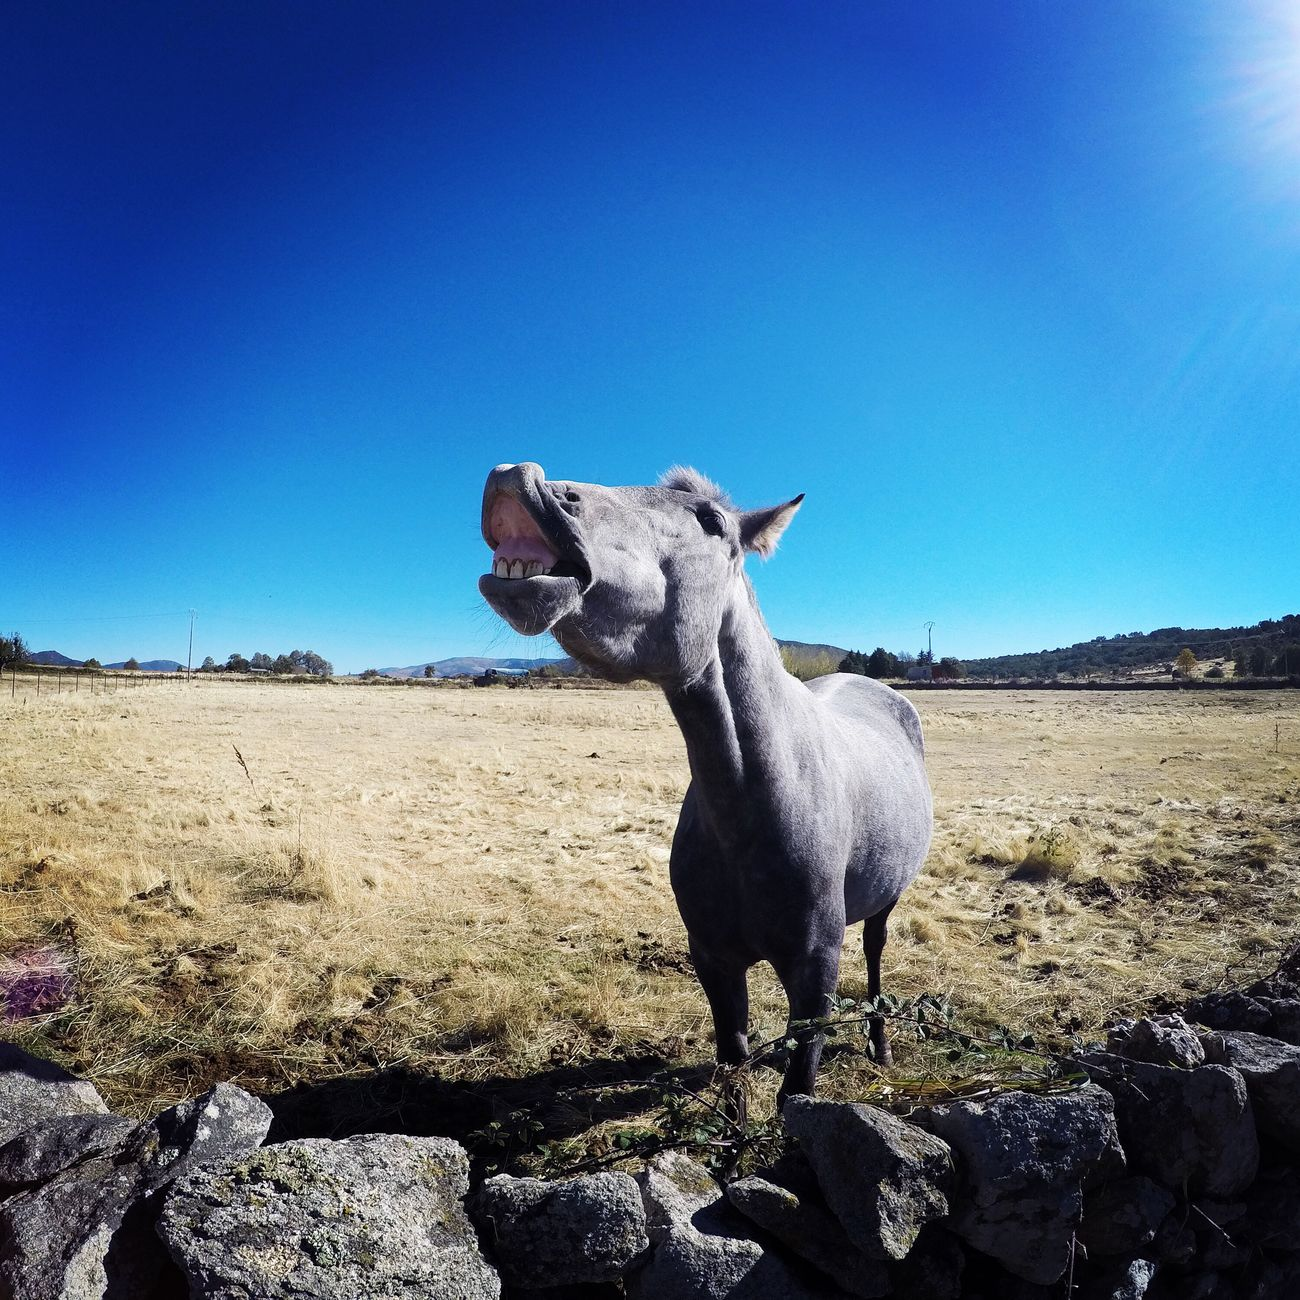 Horse Goprooftheday Nikond5300 Smile SPAIN Avila